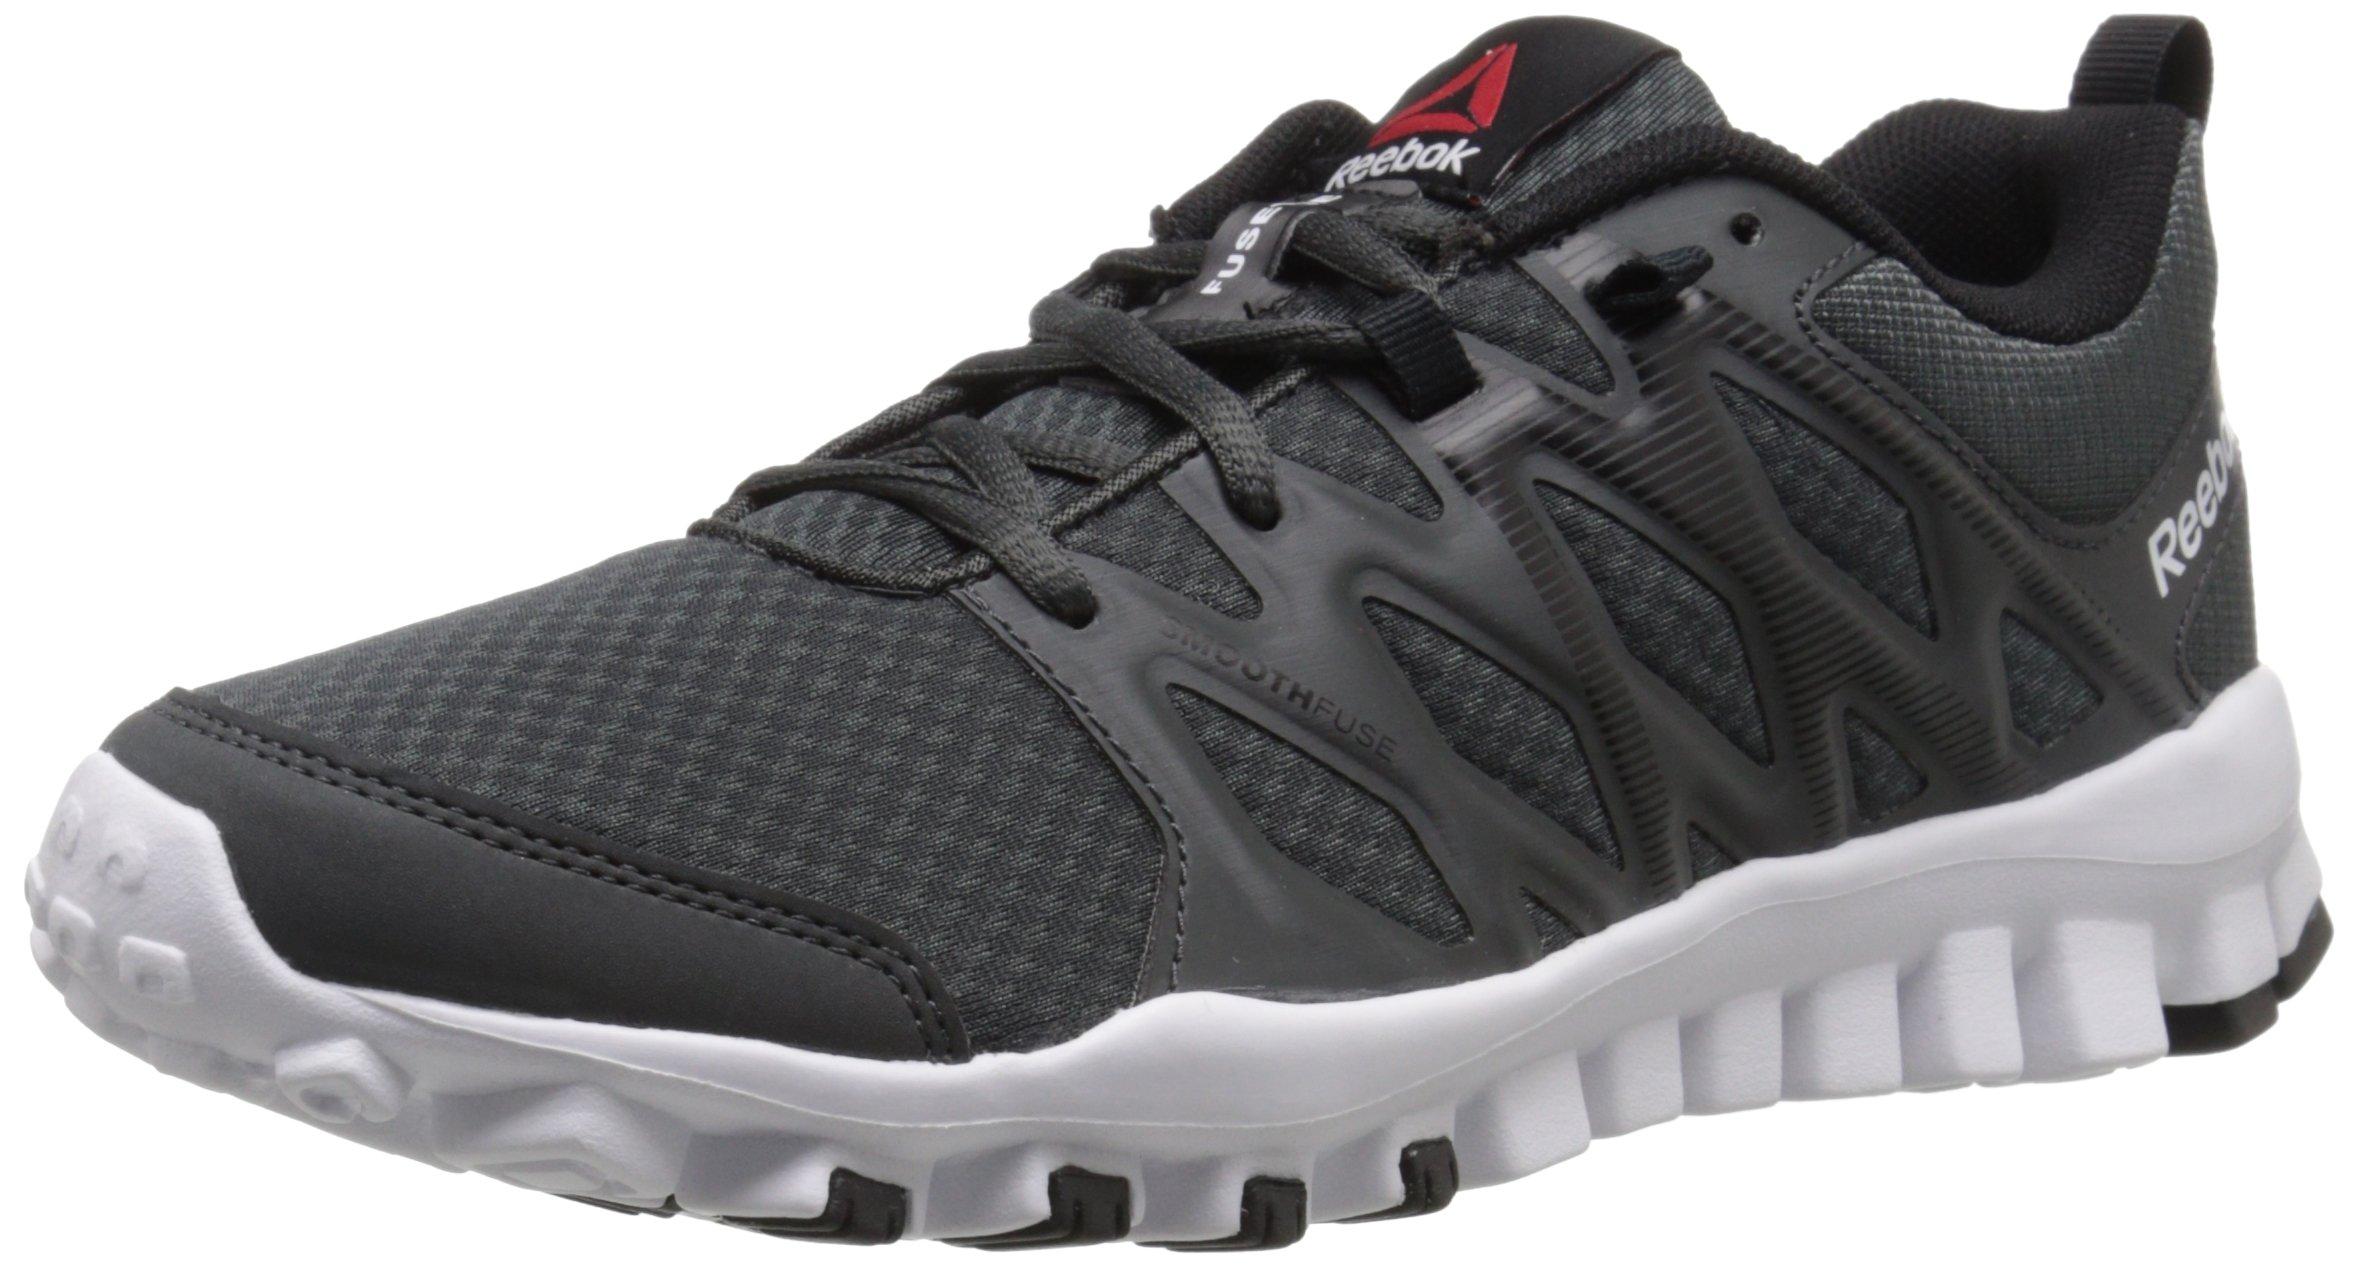 Reebok Women's Realflex 4.0 Training Shoe, Gravel/Black/White, 7 M US by Reebok